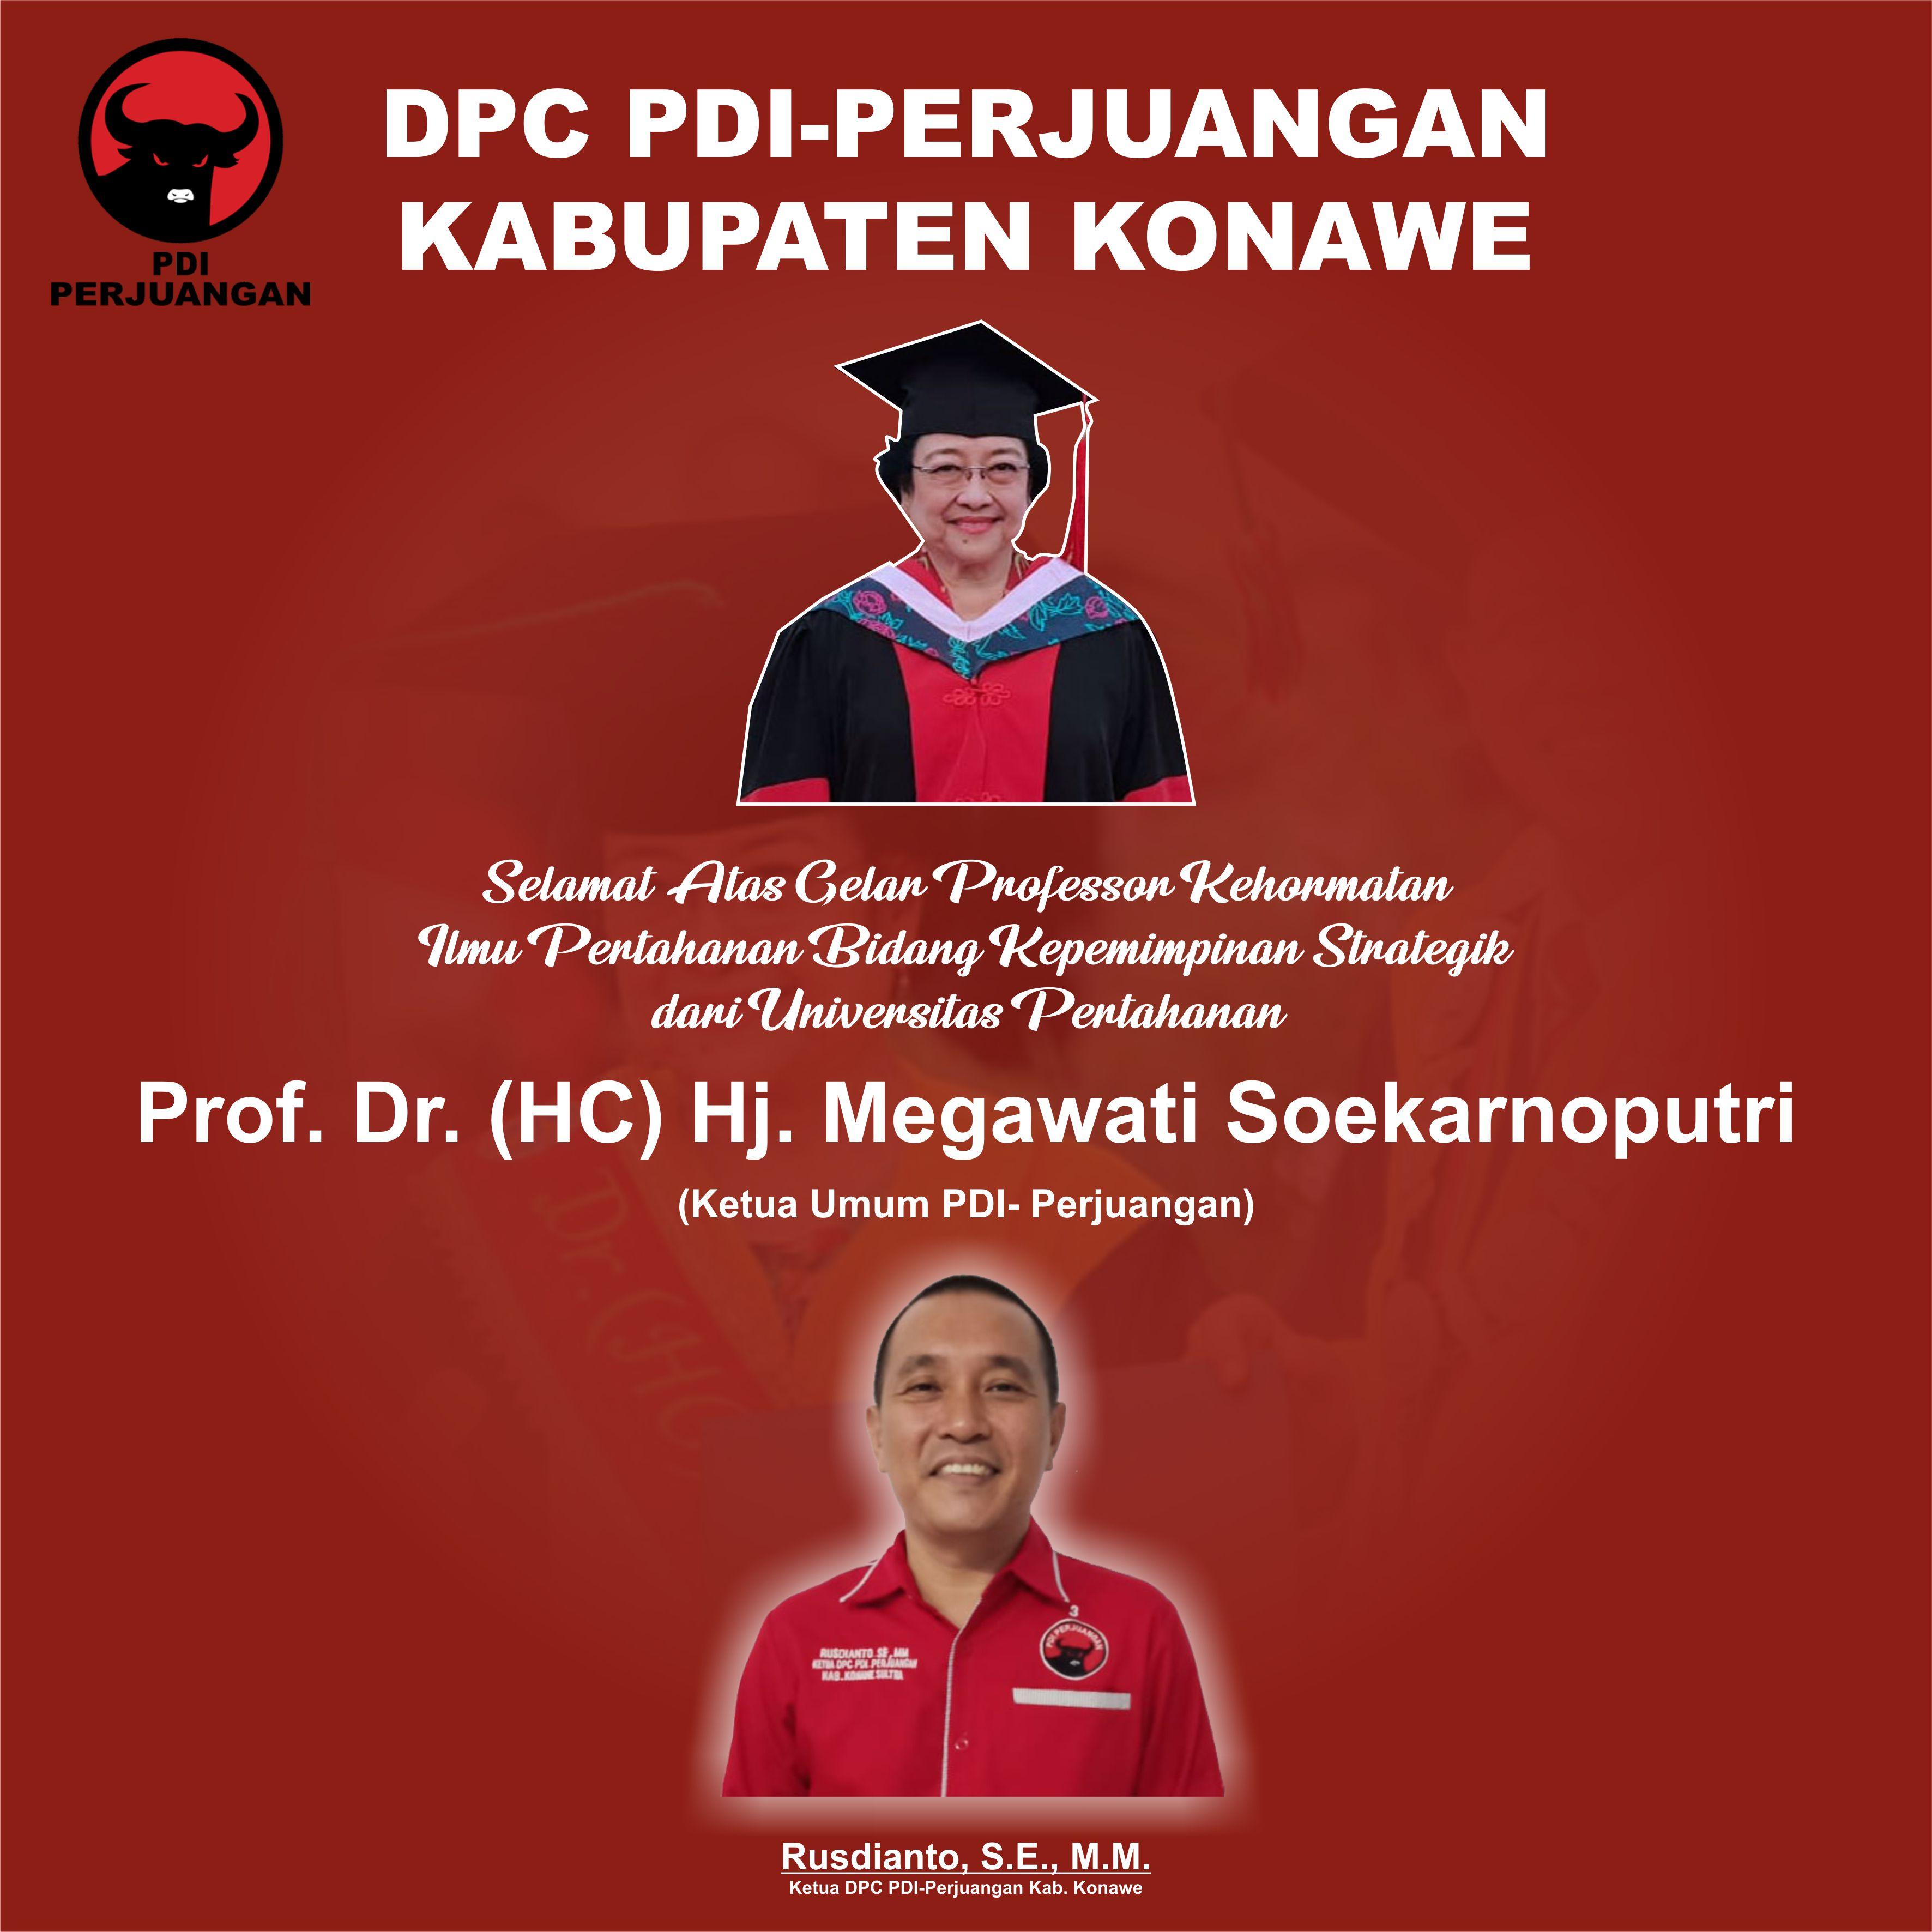 Profesor Megawati